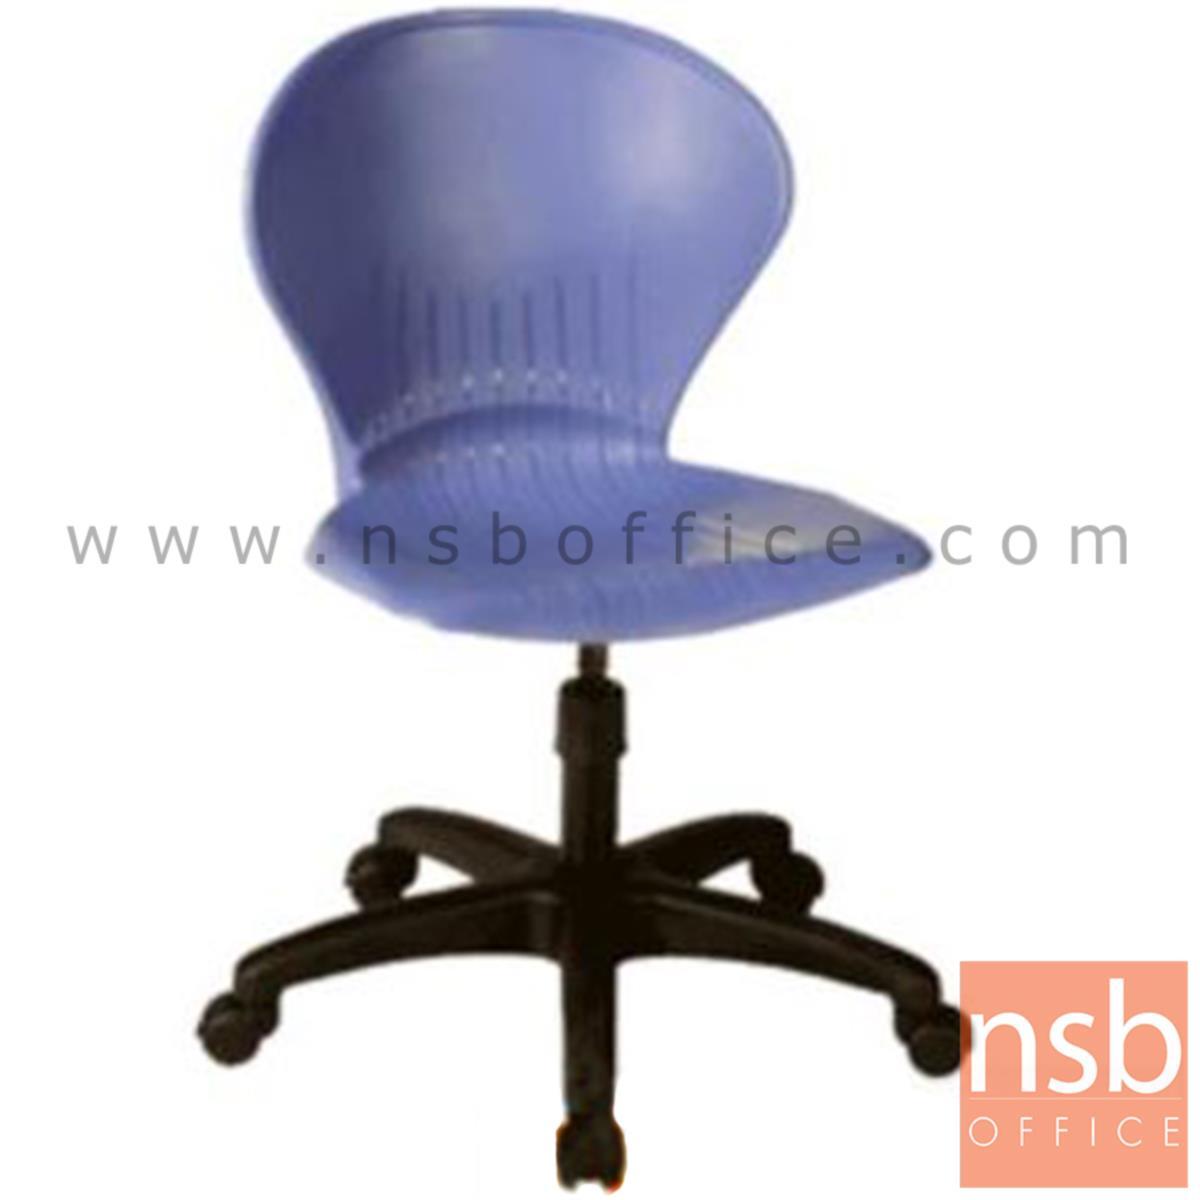 B21A008:เก้าอี้สำนักงานโพลี่ รุ่น parley (พาร์เลย์)  ขาพลาสติก